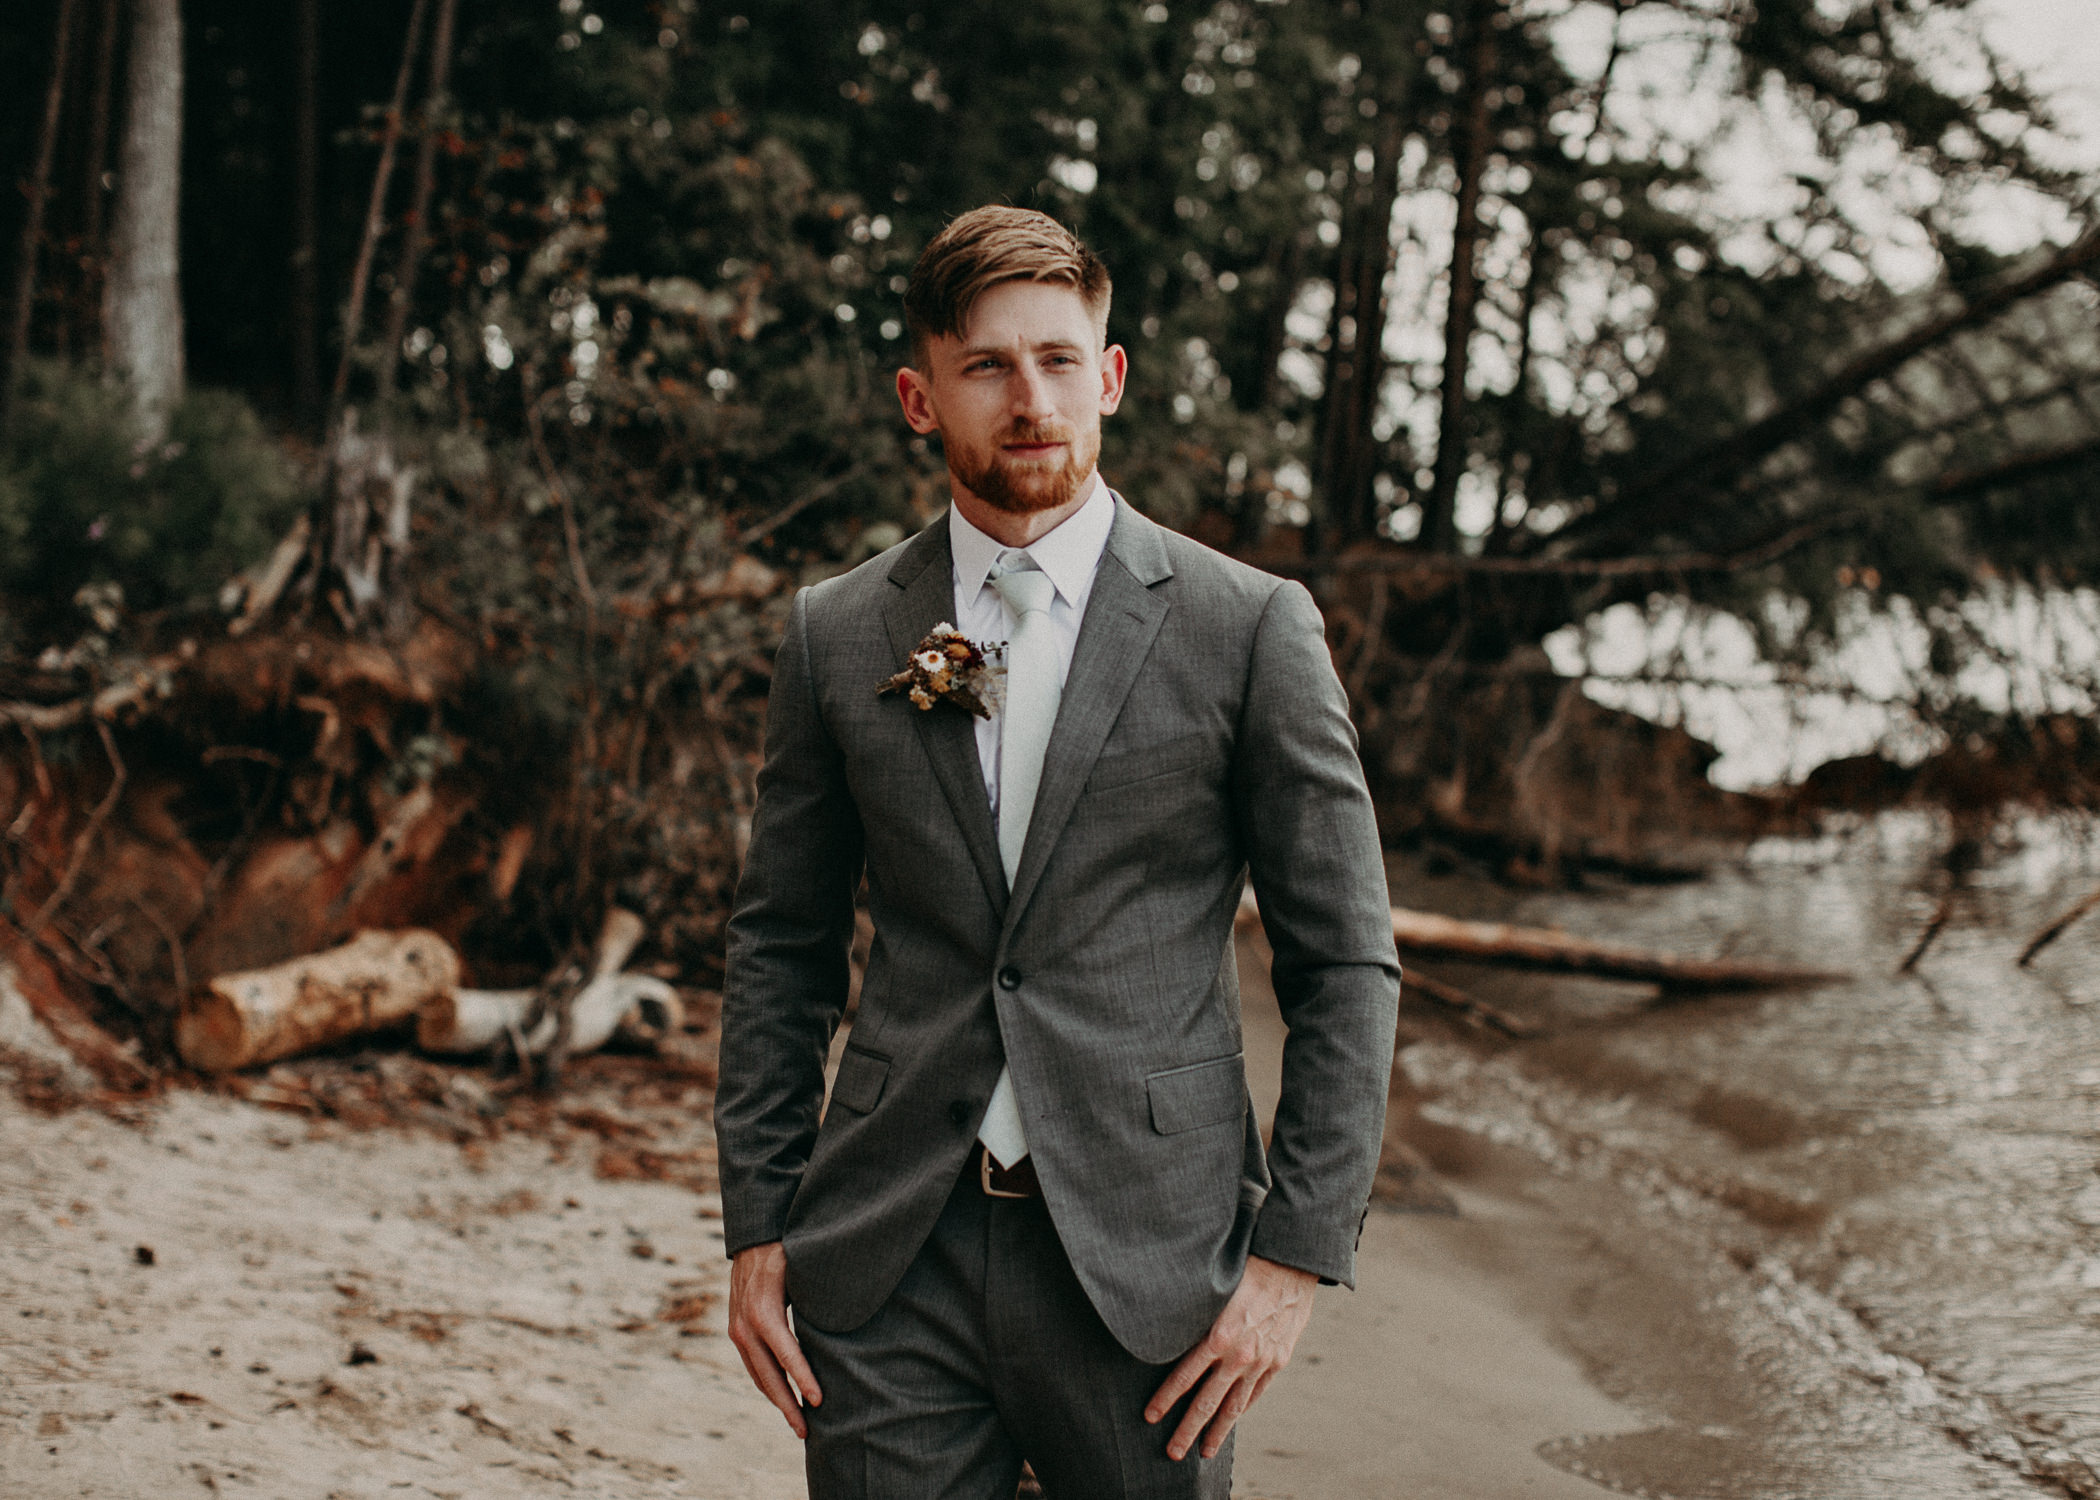 68  Bride & Groom Portraits before the ceremony on wedding day - Atlanta Wedding Photographer .jpg